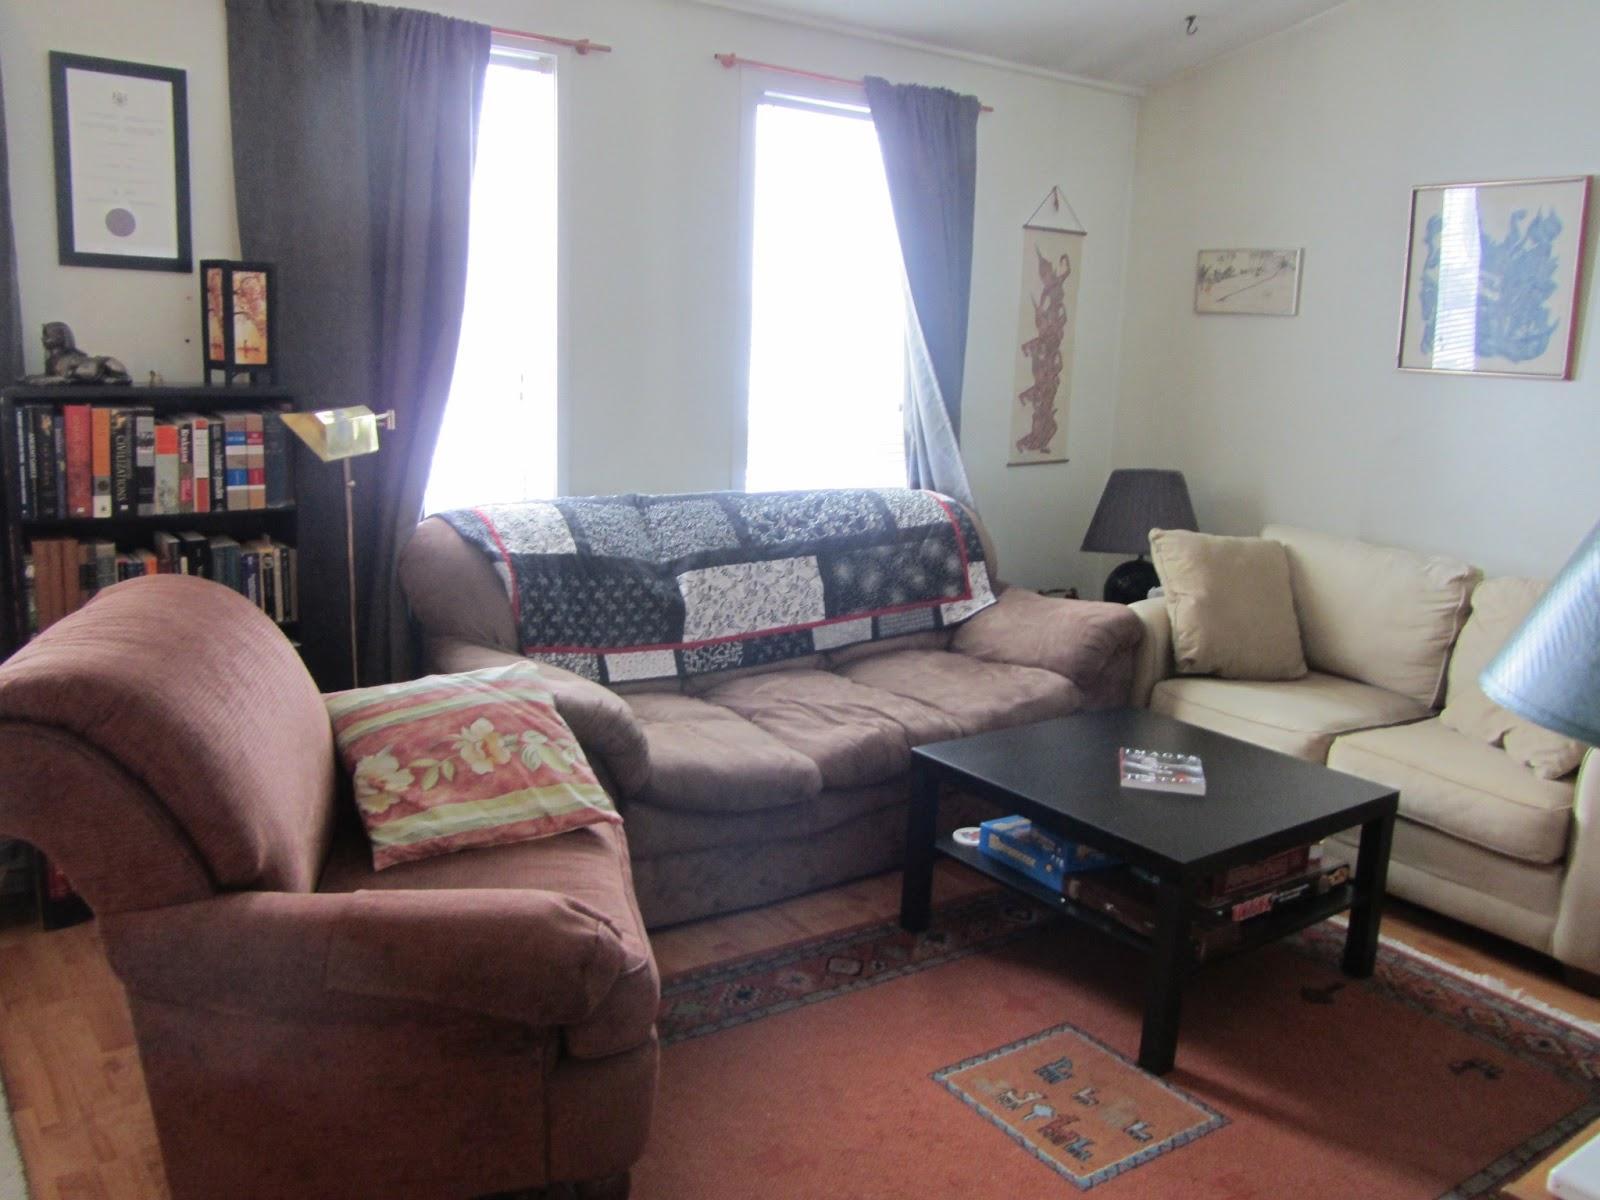 real living room | Ayathebook.com